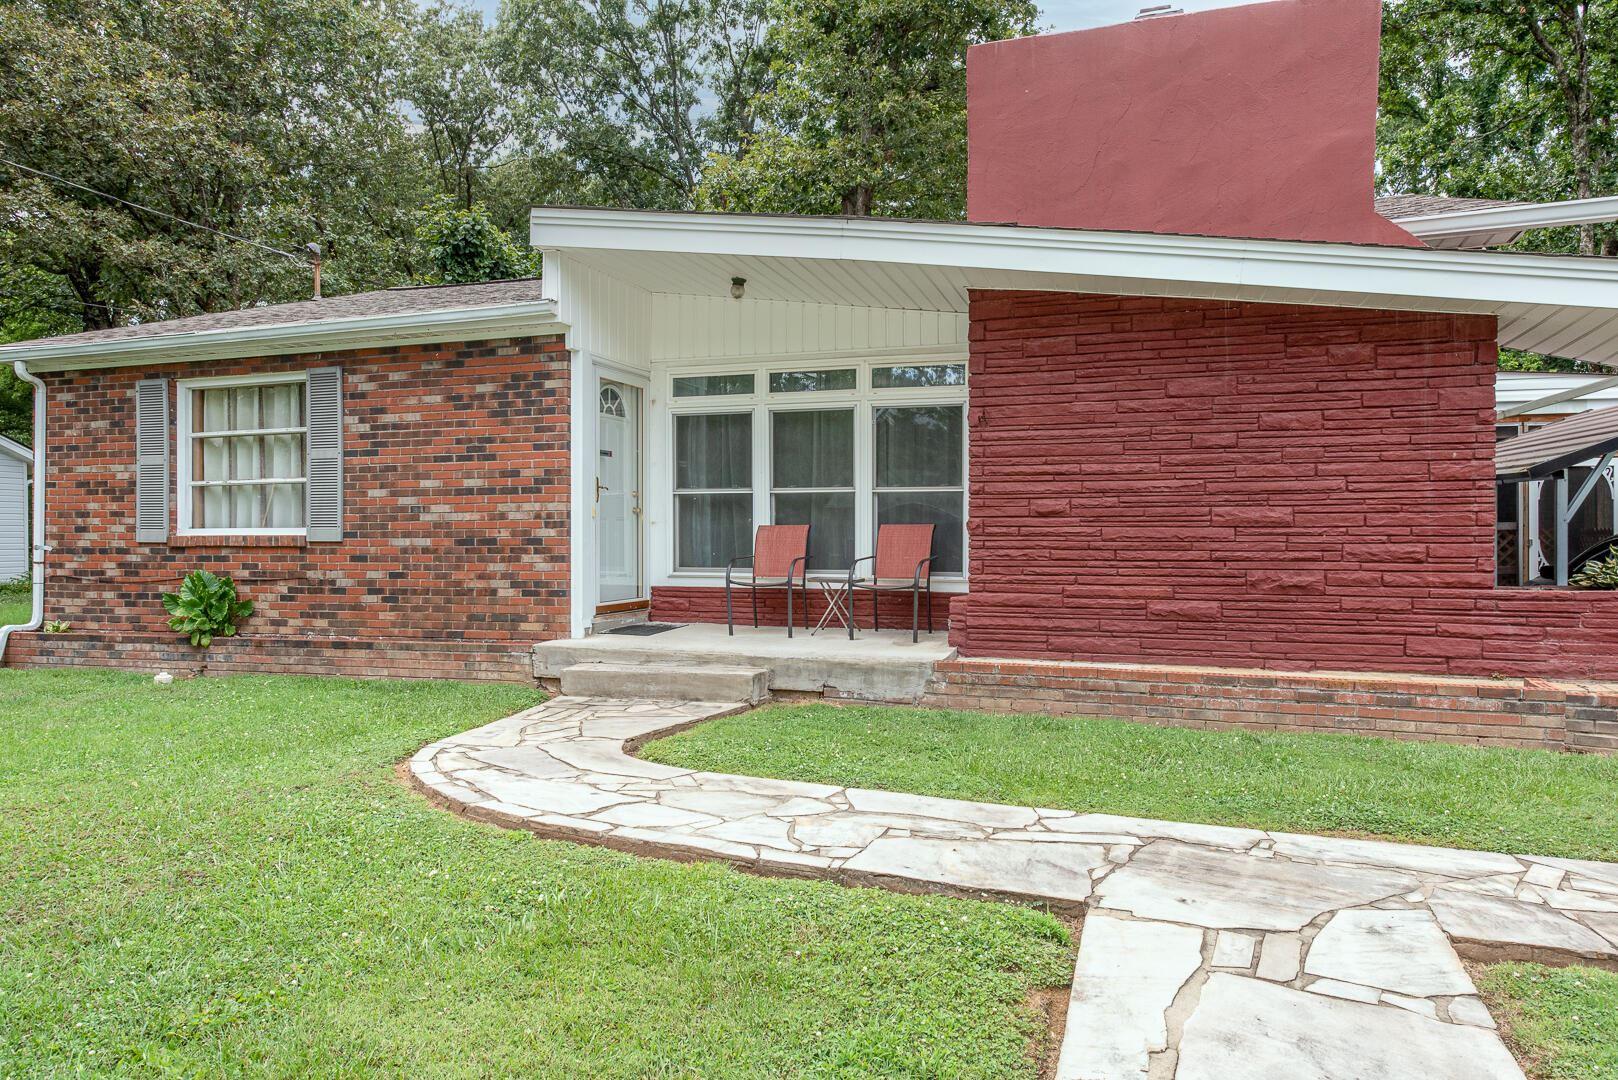 Photo of 803 W 6Th Ave, Lenoir City, TN 37771 (MLS # 1161359)